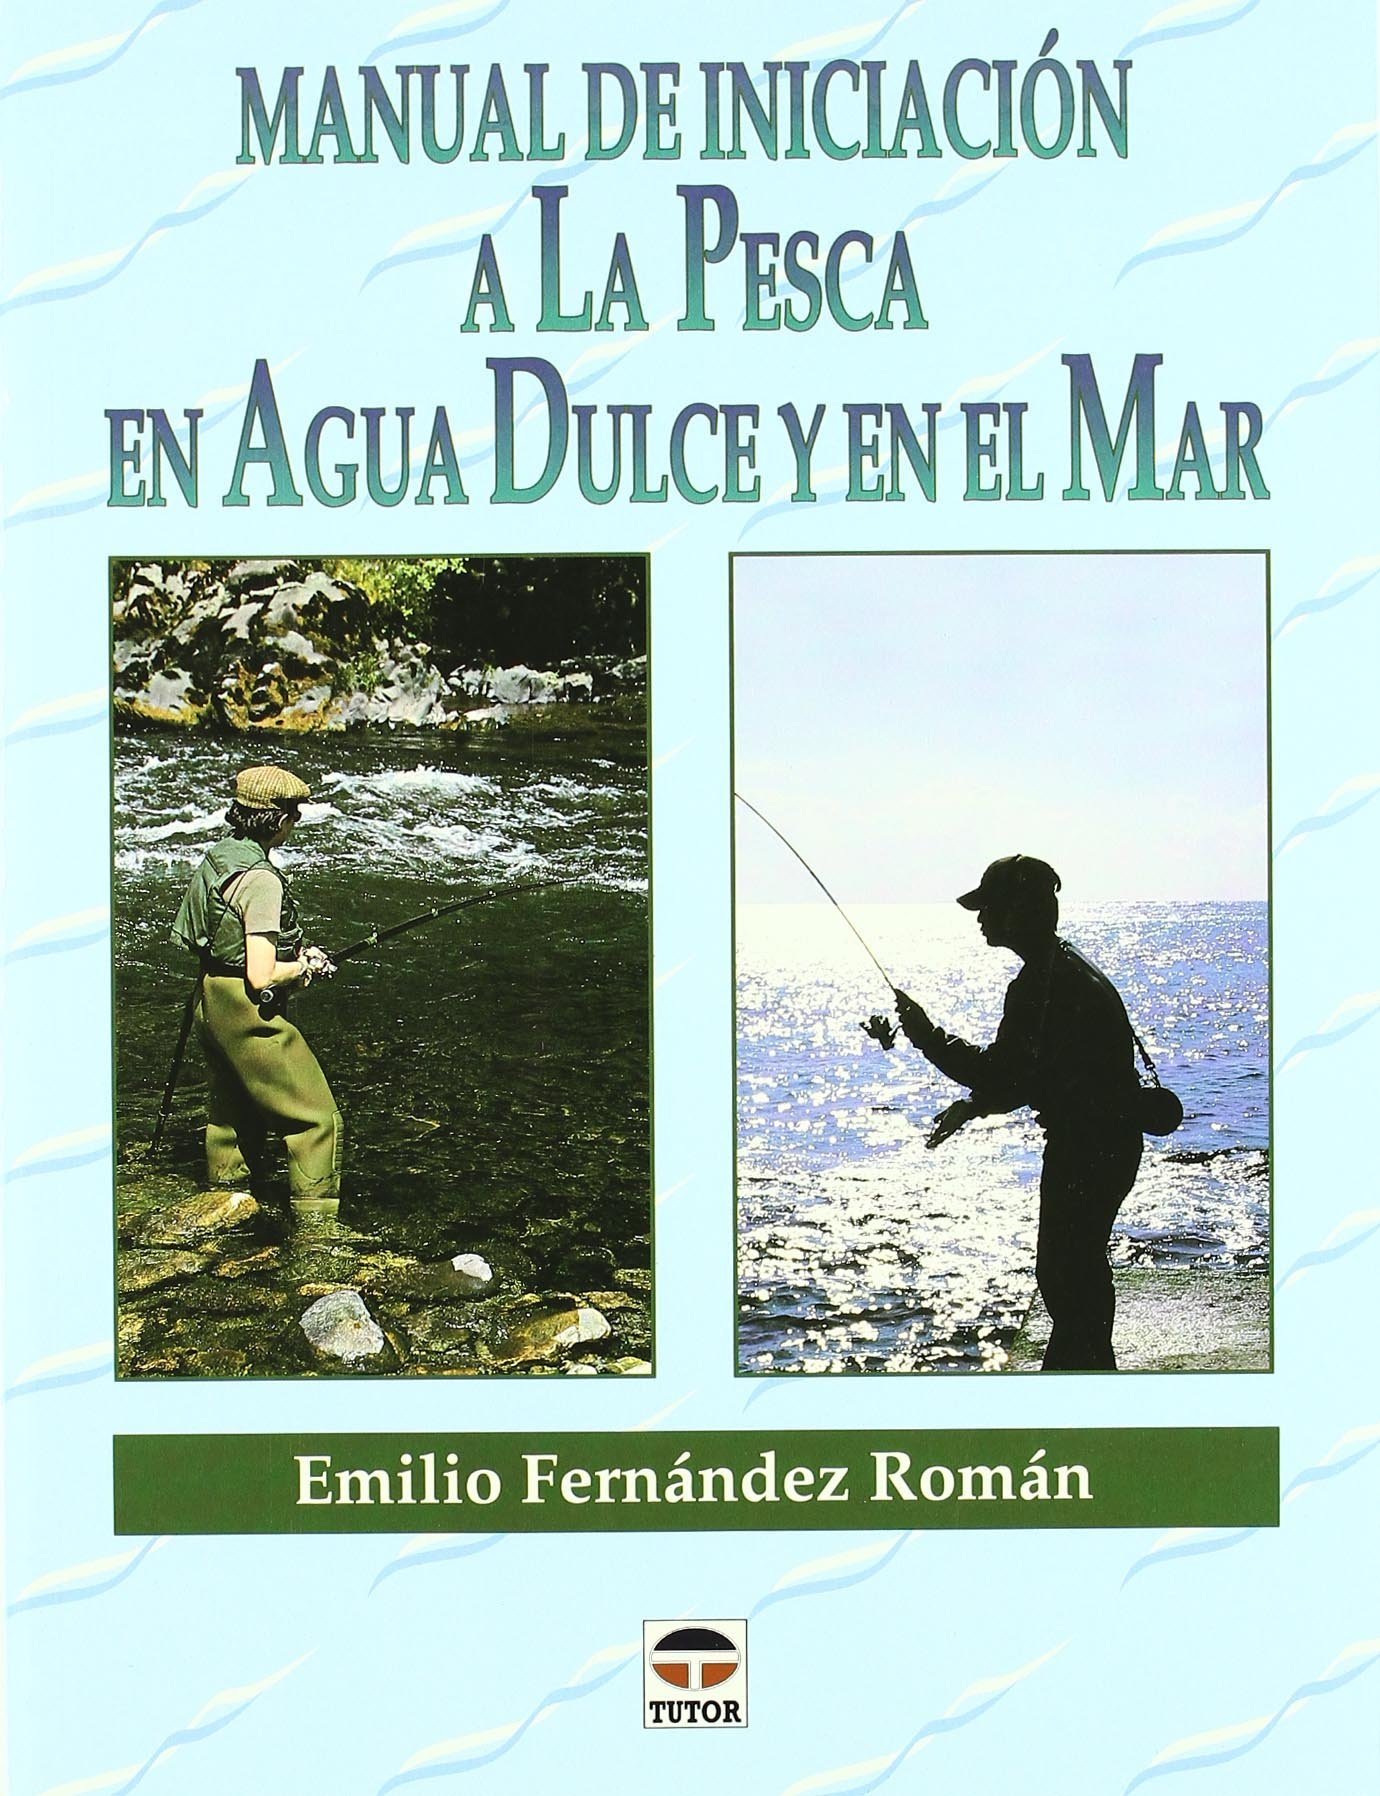 Manual de Iniciacion a Pesca En Agua Dulce y Mar (Spanish Edition) (Spanish) Paperback – September, 2001